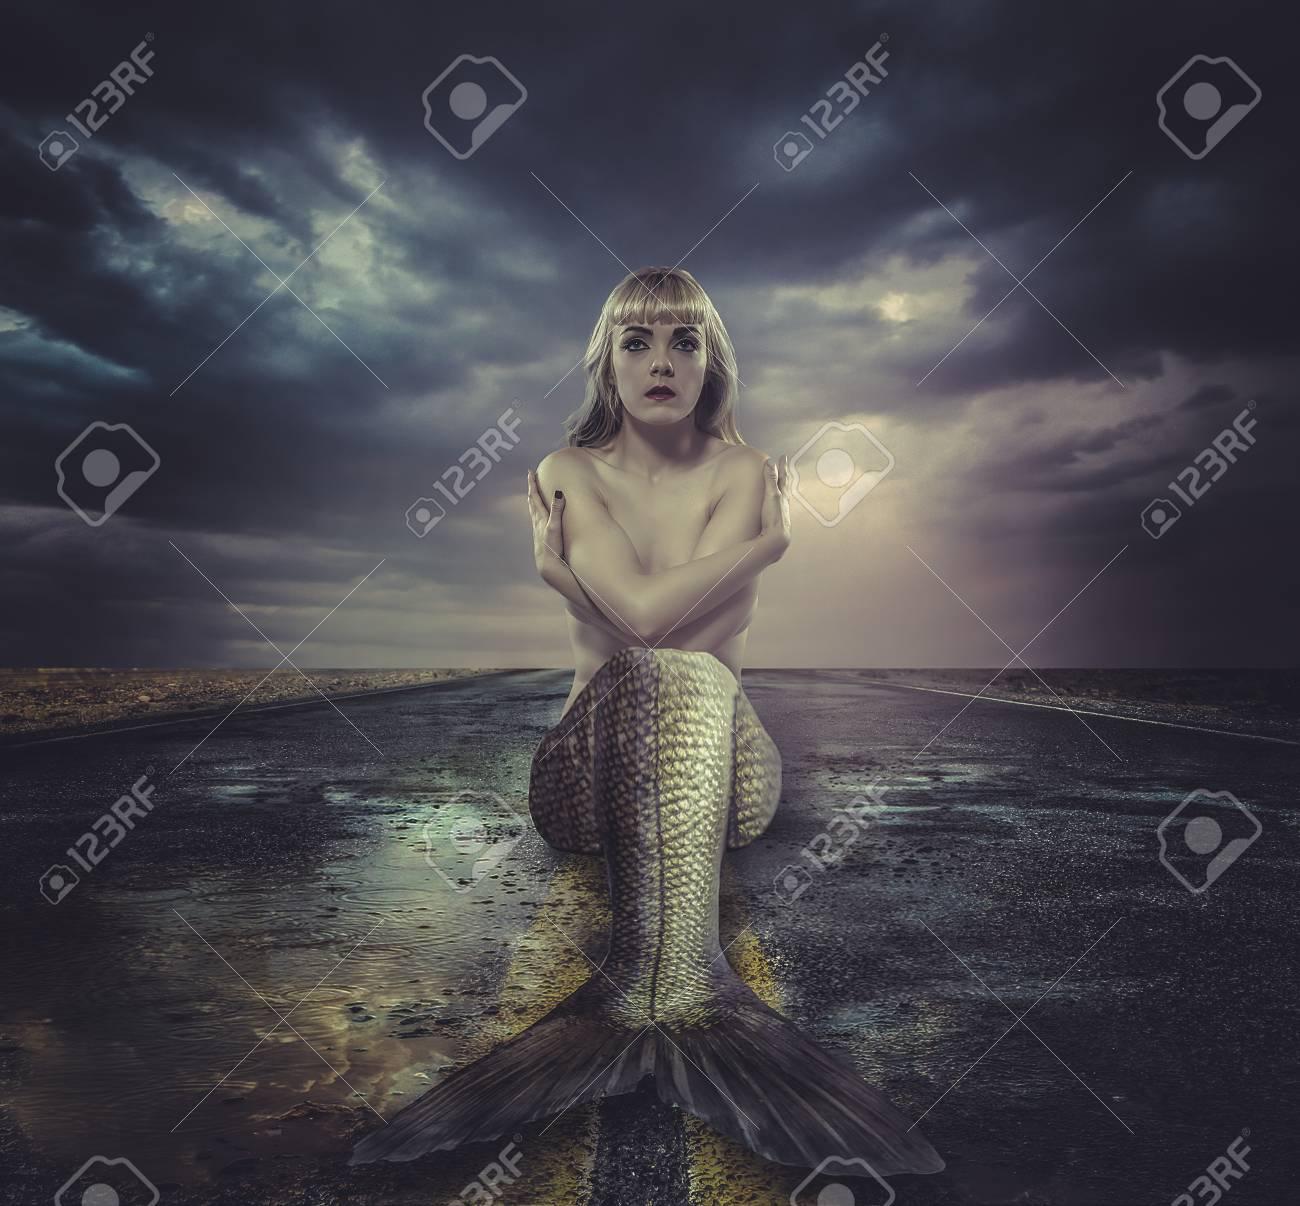 mermaid sitting on a deserted road - 30352654